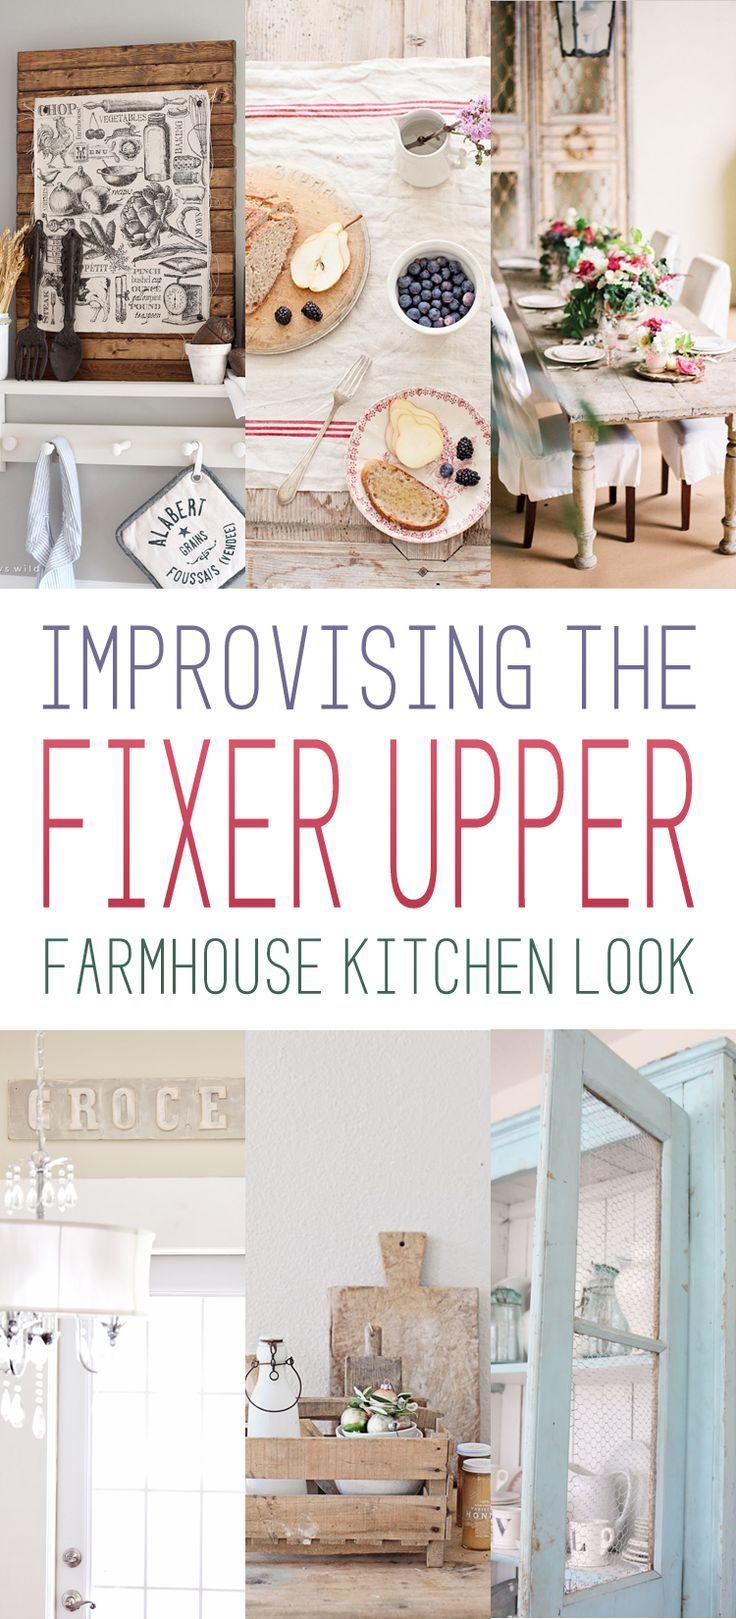 the fixer upper farmhouse kitchen look farm house pinterest bauernk chen landh user und. Black Bedroom Furniture Sets. Home Design Ideas